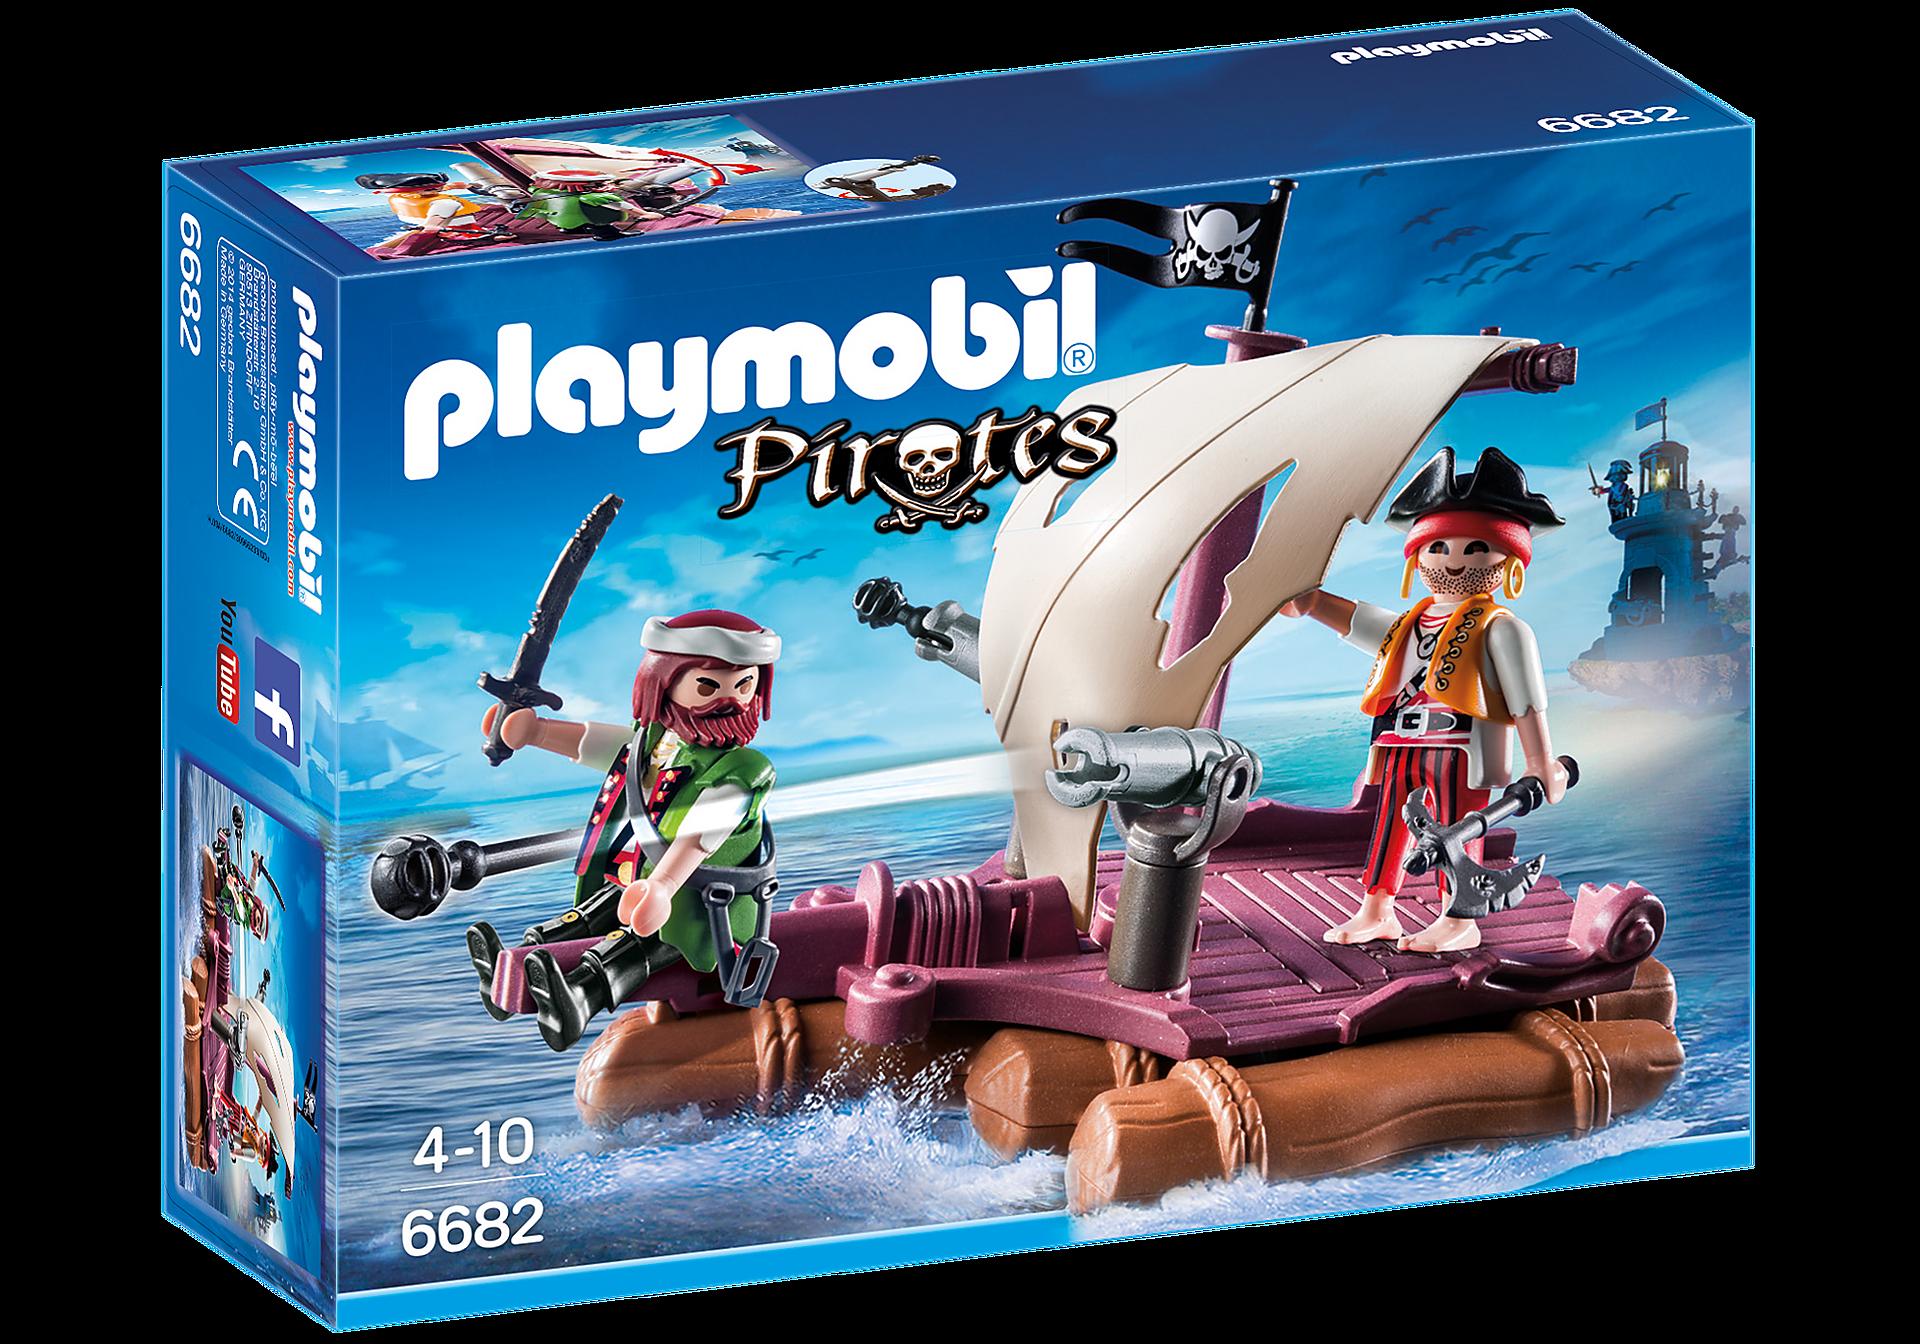 http://media.playmobil.com/i/playmobil/6682_product_box_front/Pirate Raft